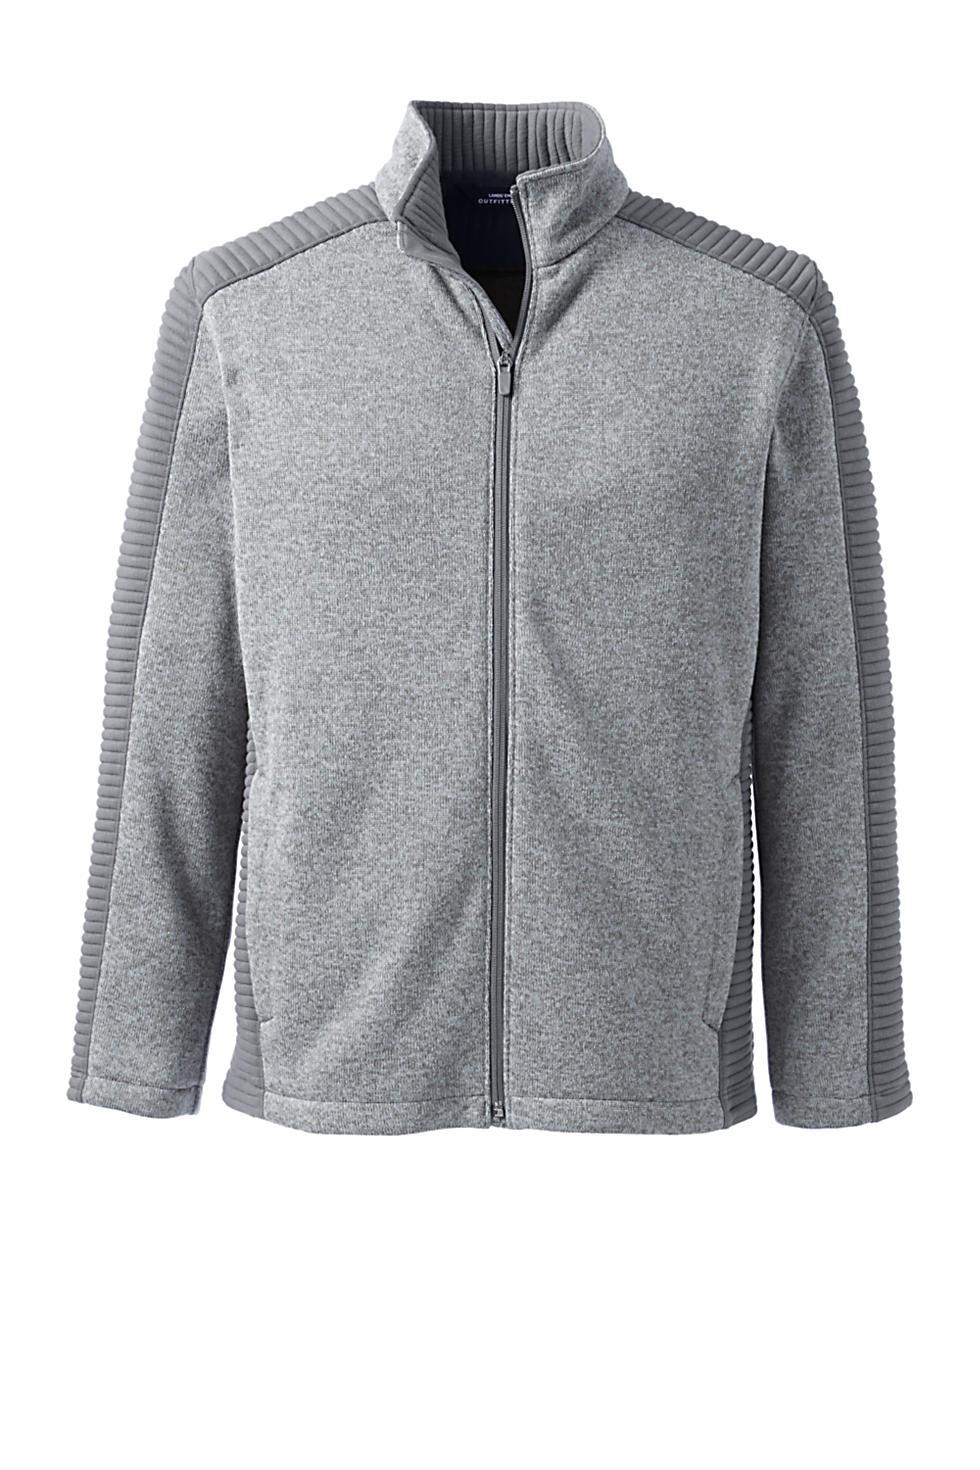 Lands' End Men's Textured Sweater Fleece Jacket (various colors/sizes)